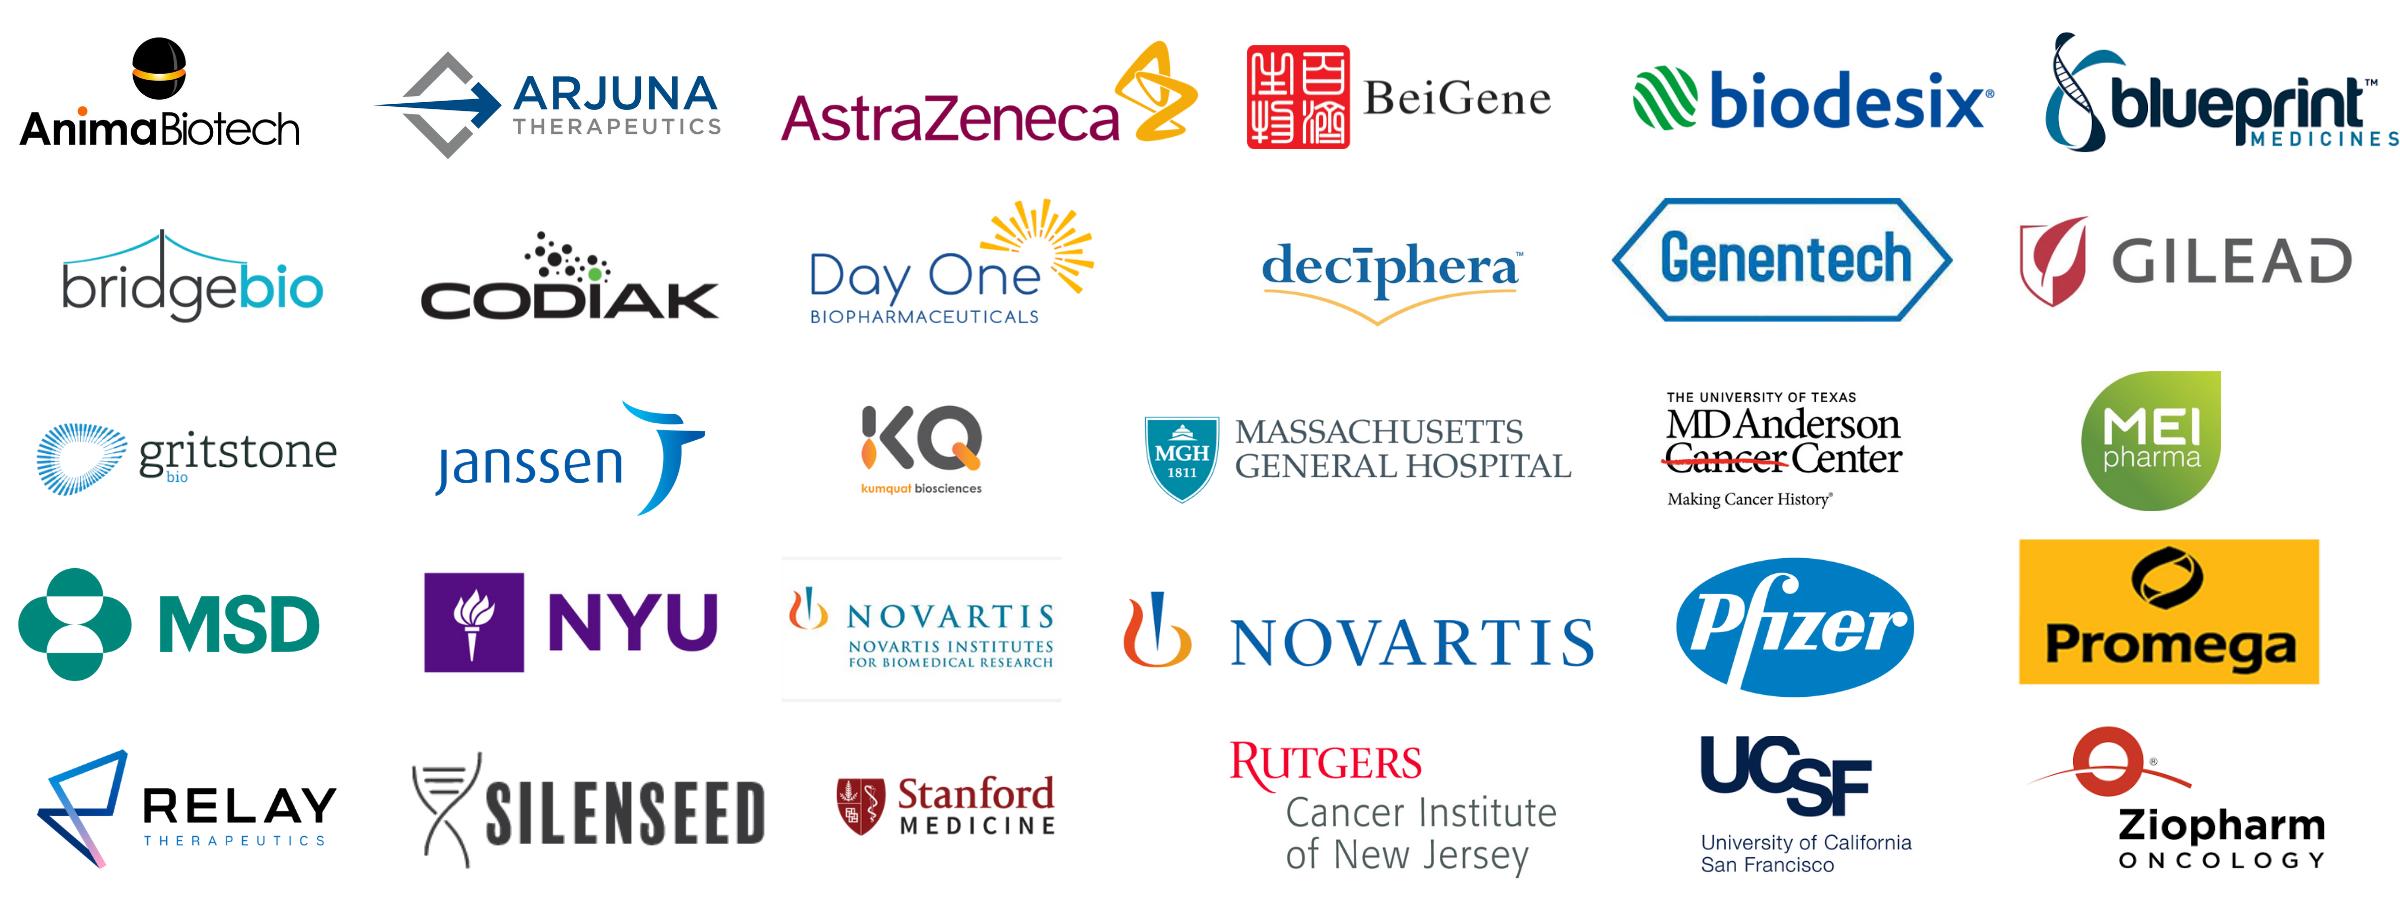 Companies attending - RAS